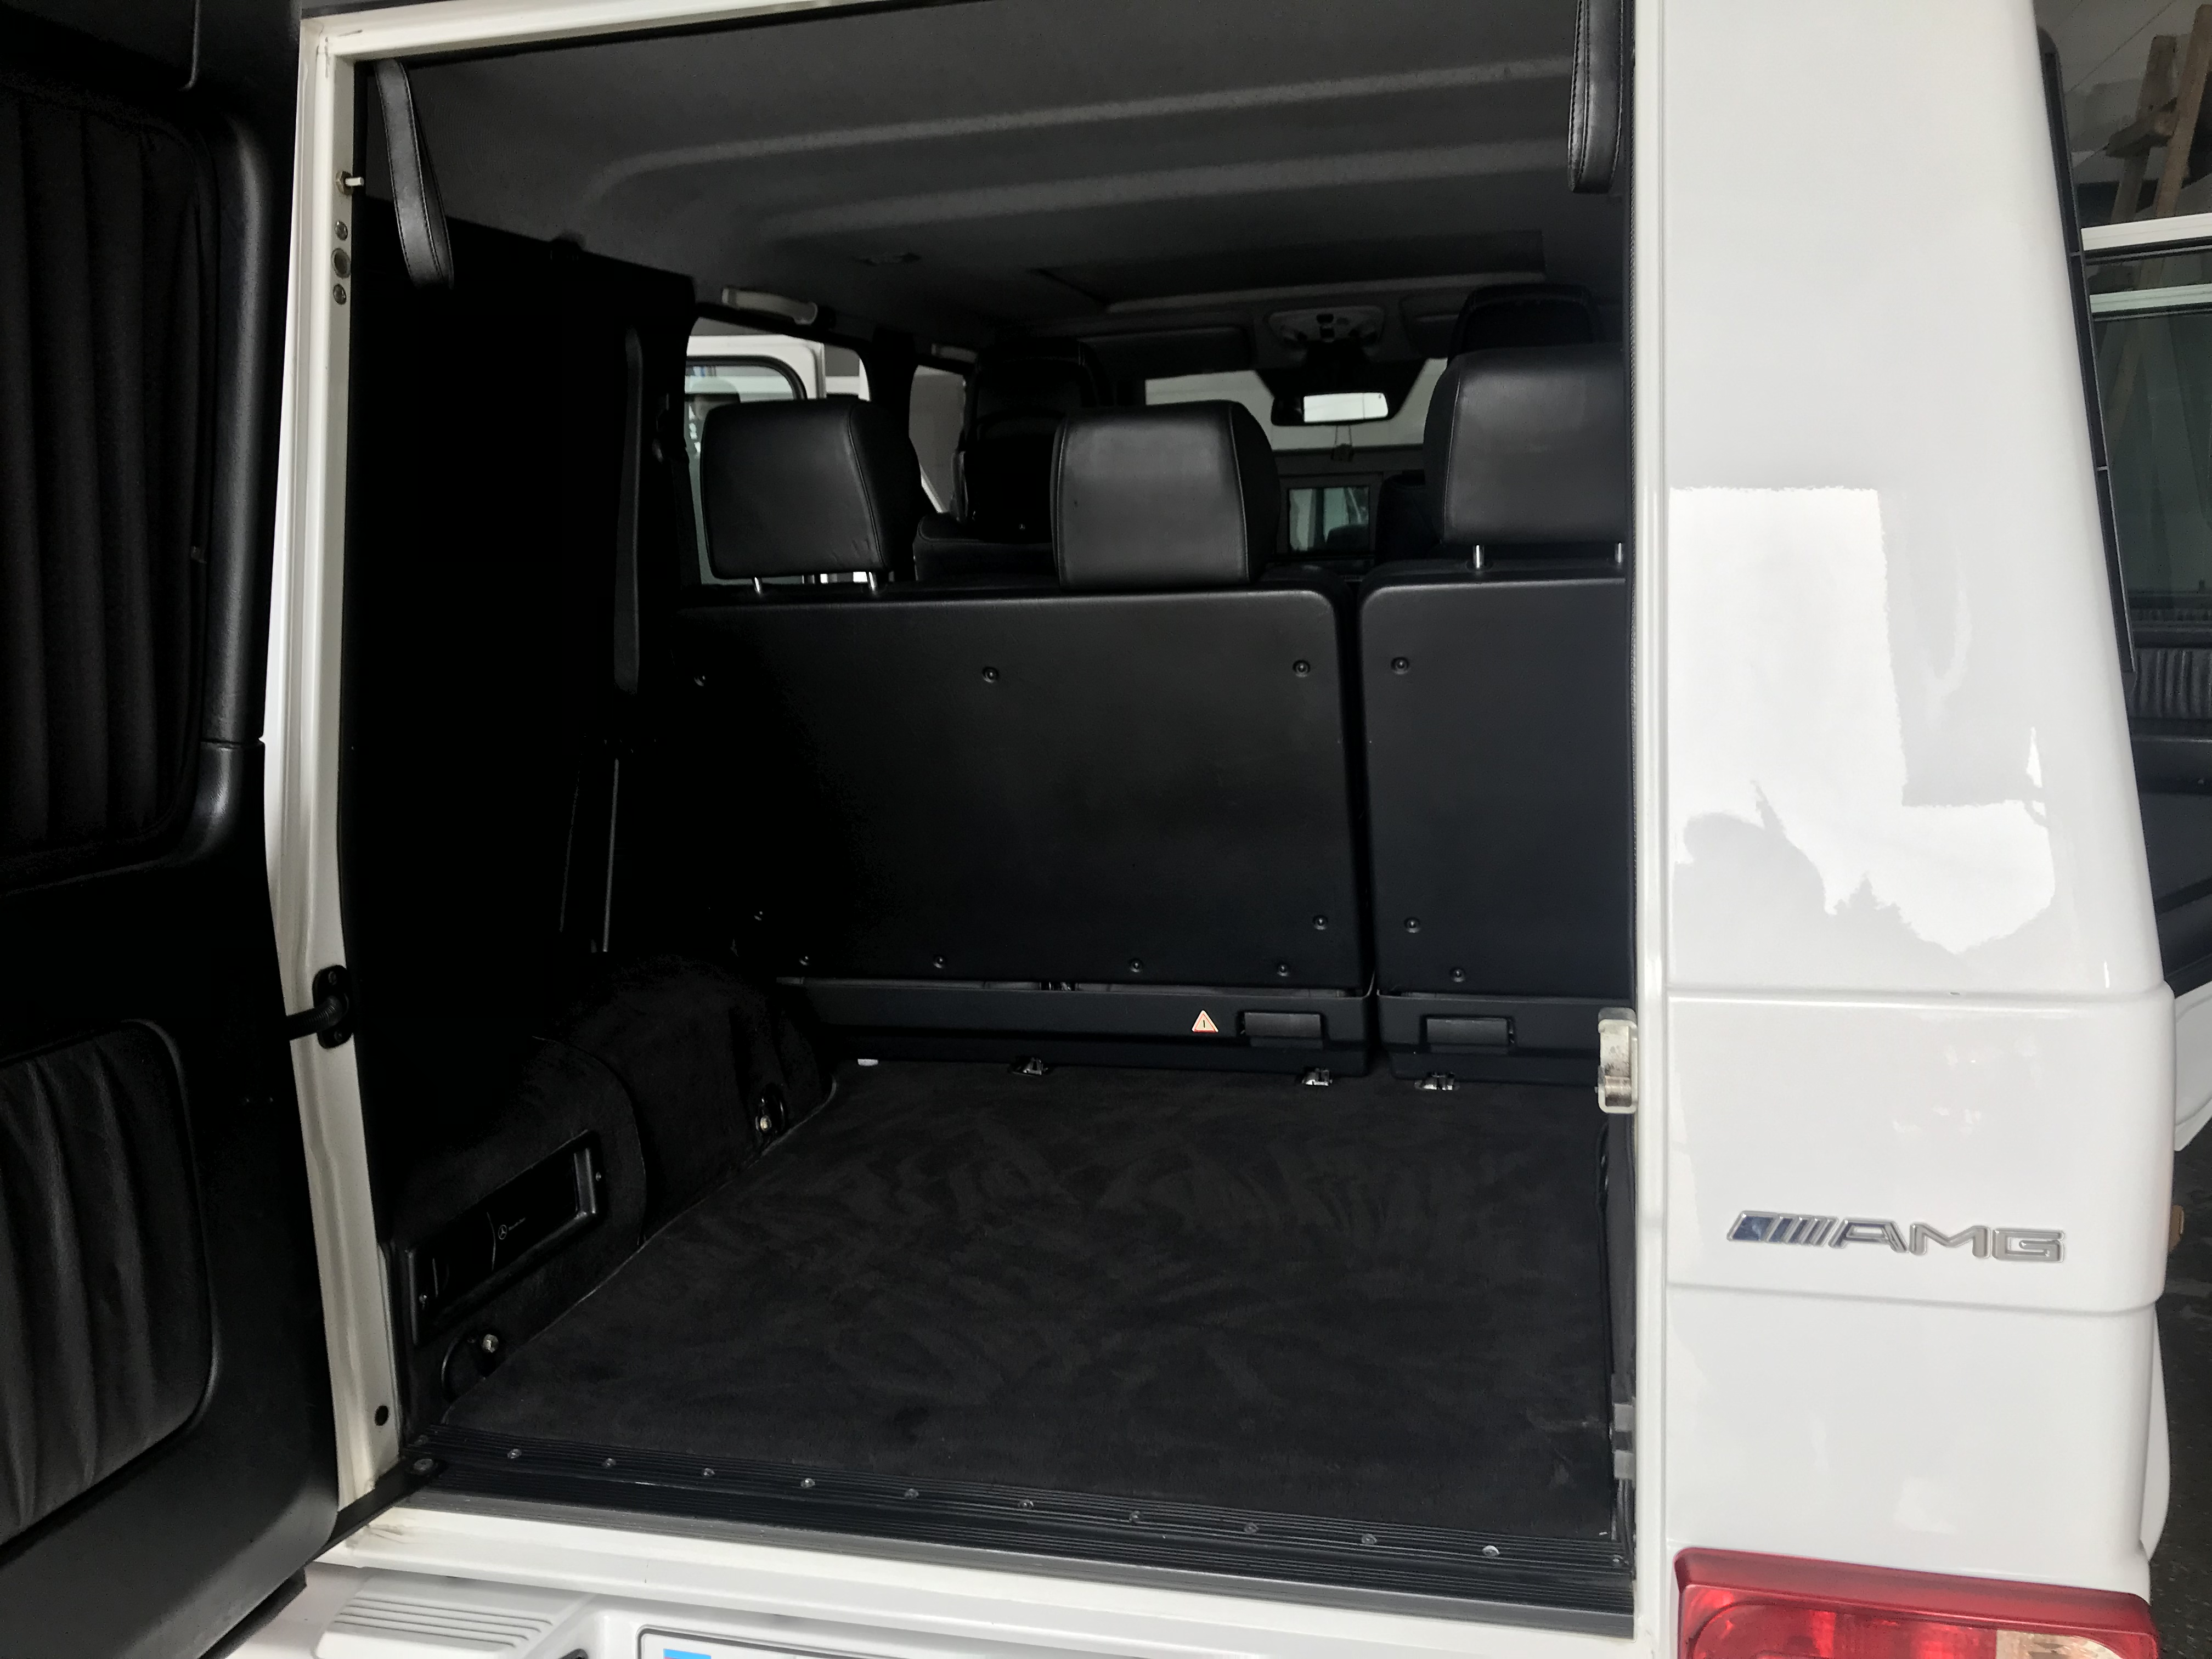 Mercedes-Benz G 320 3.2(lt) 2001 İkinci əl  $40900